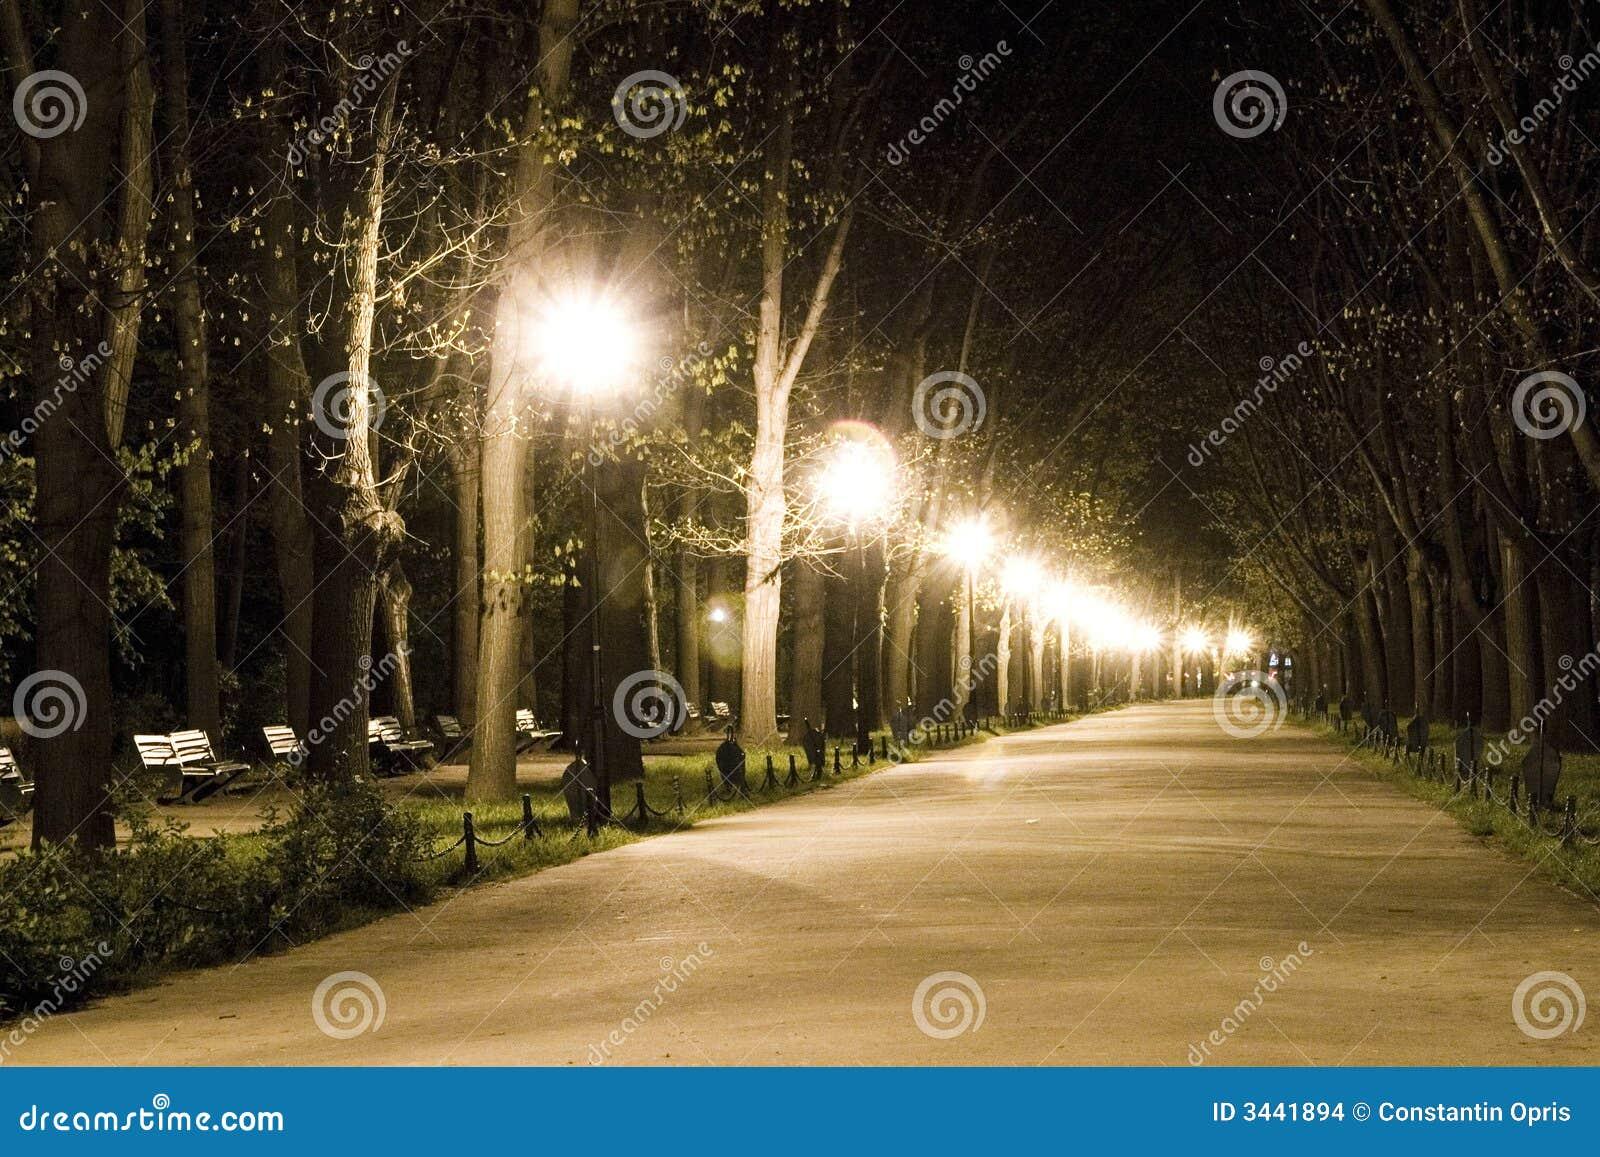 Walk in park at night